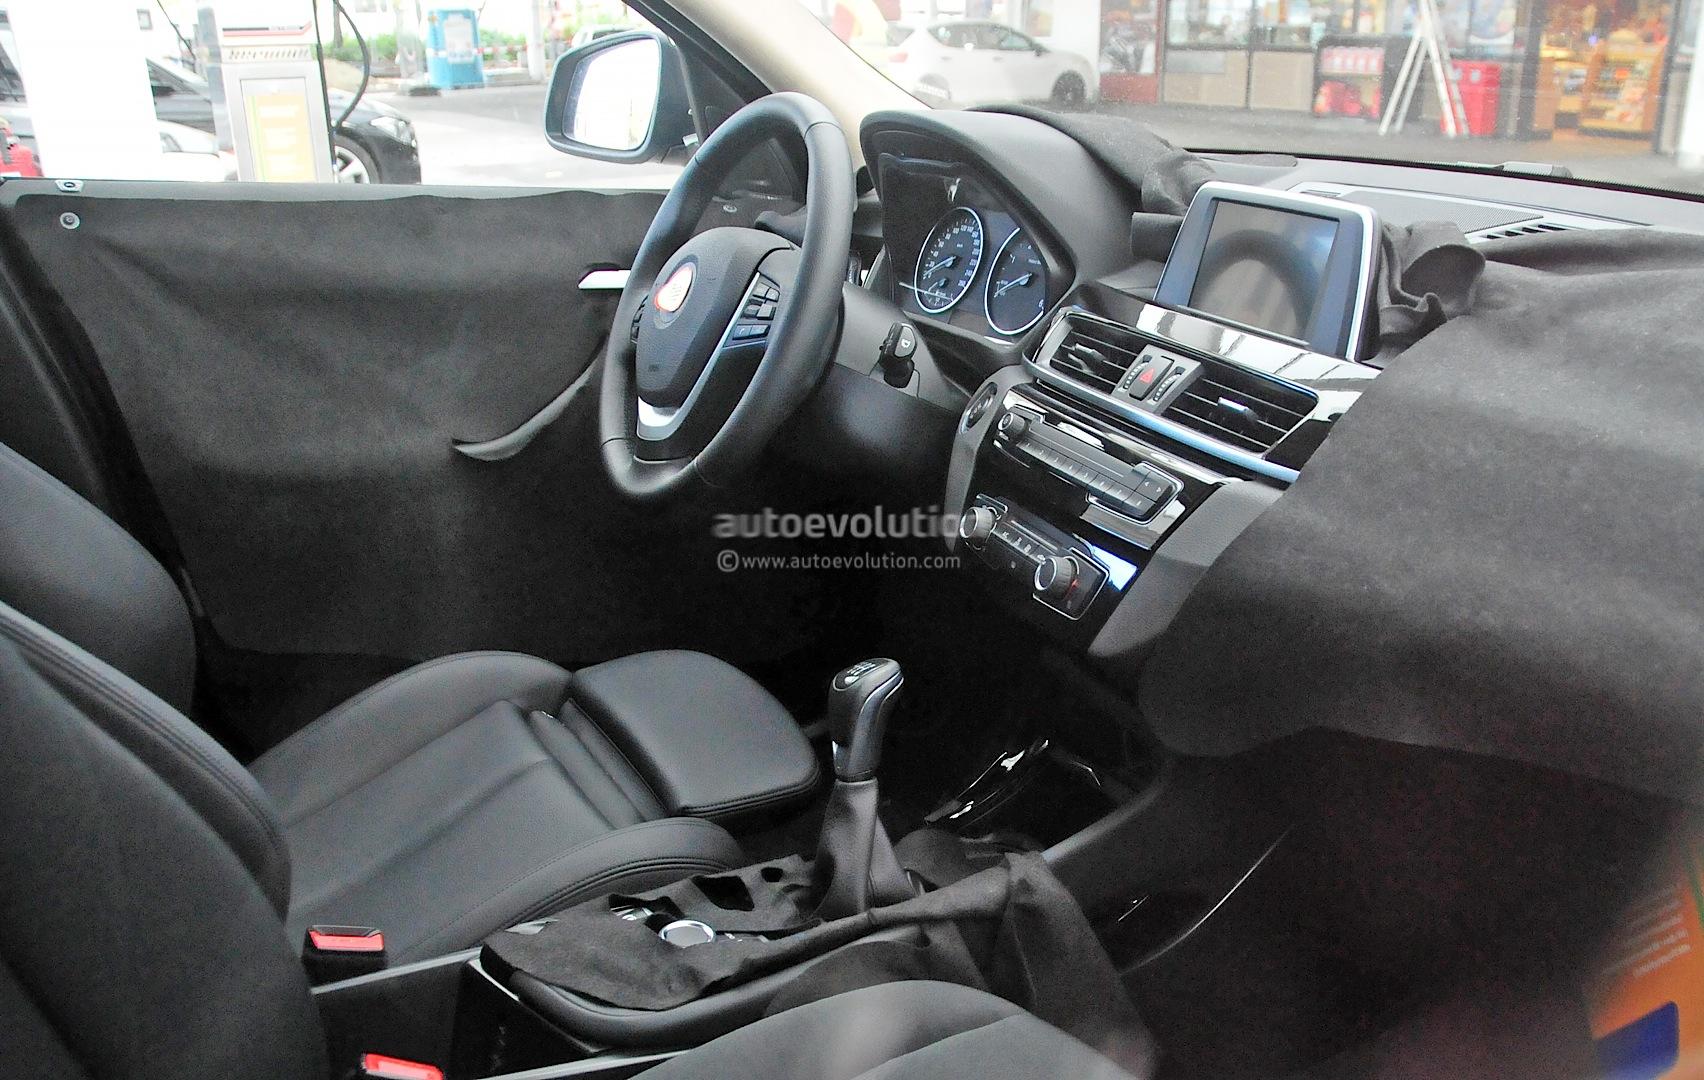 2016 Bmw X1 Interior Revealed In Spy Photos Autoevolution